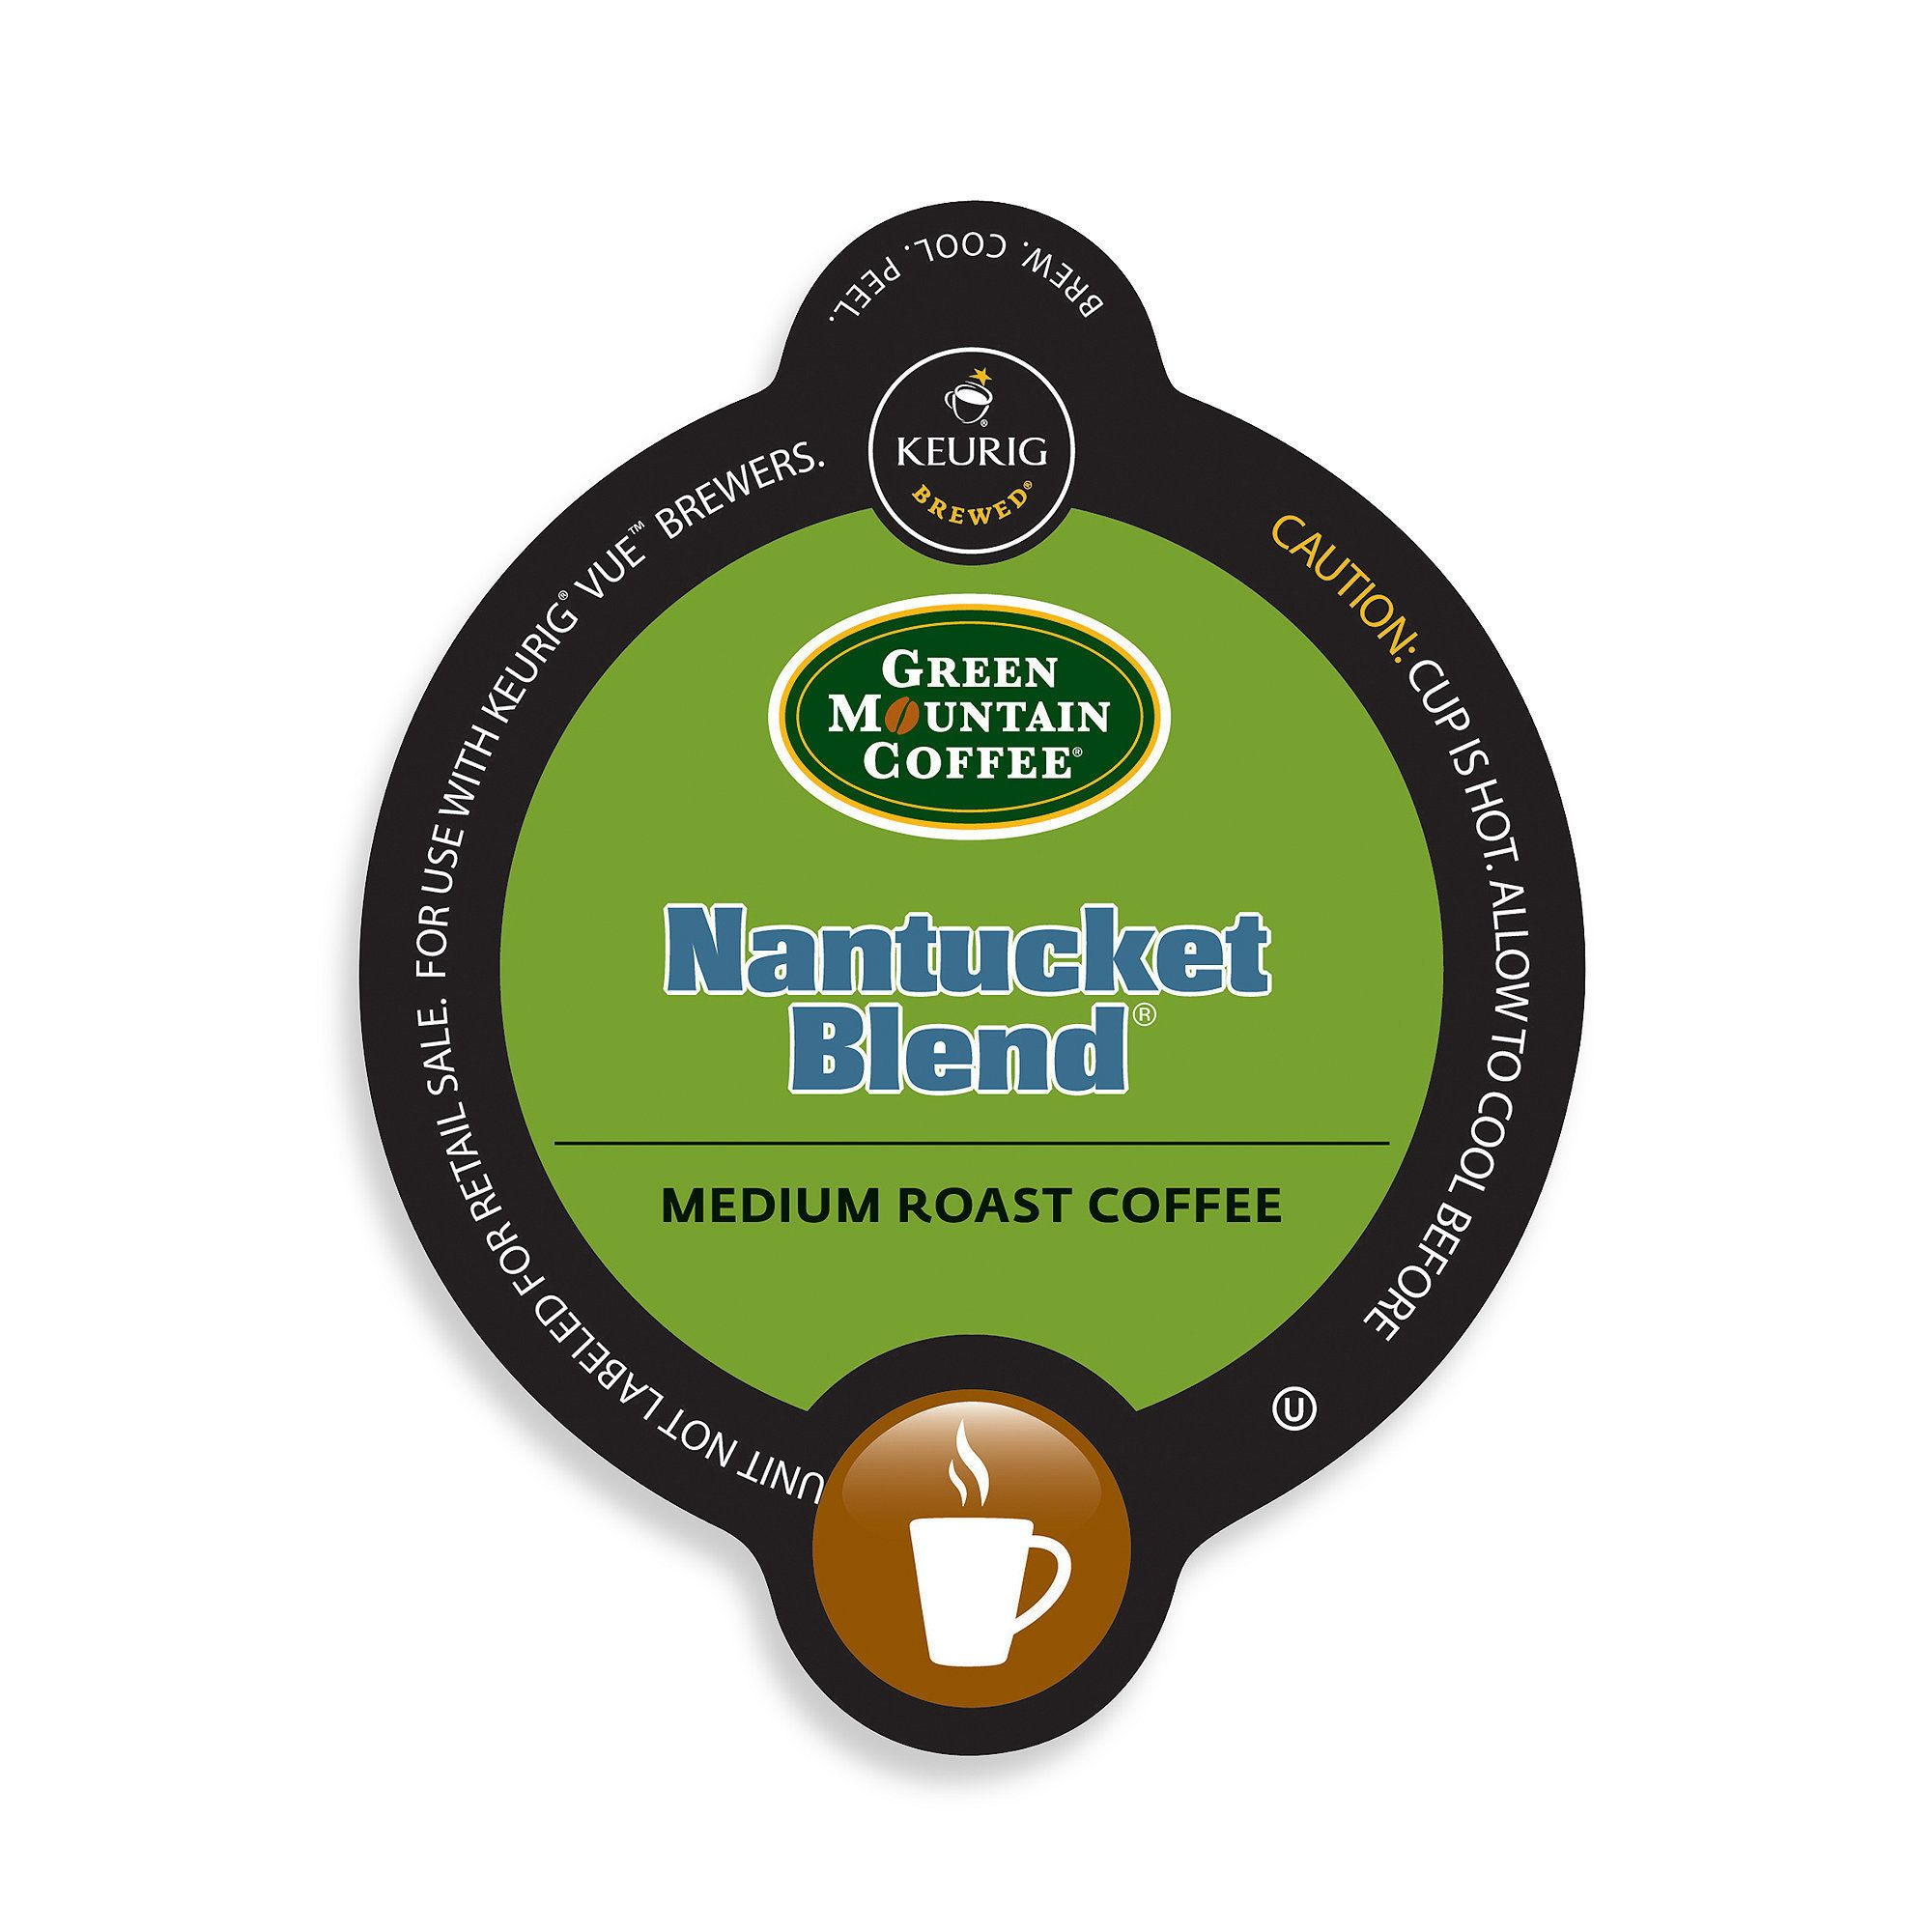 Green Mountain Coffee Nantucket Blend, Vue Cup Portion